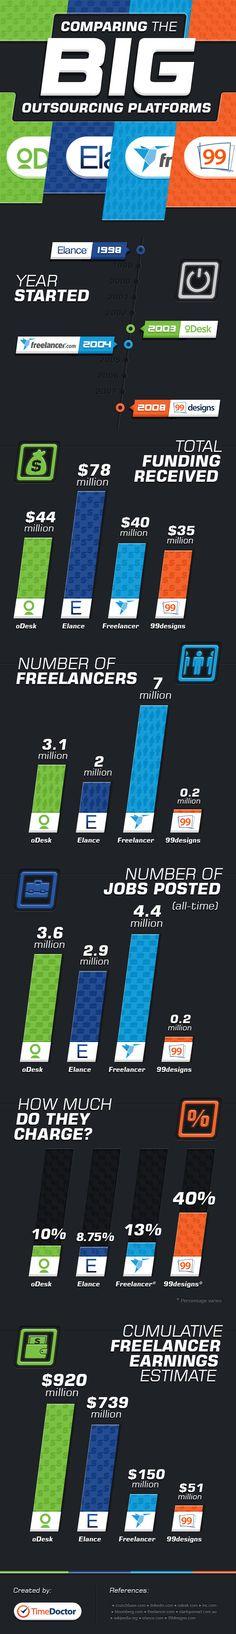 oDesk vs Elance vs Freelancer and 99designs [Infographic] - http://www.alleywatch.com/2013/07/odesk-vs-elance-vs-freelancer-and-99designs-infographic/